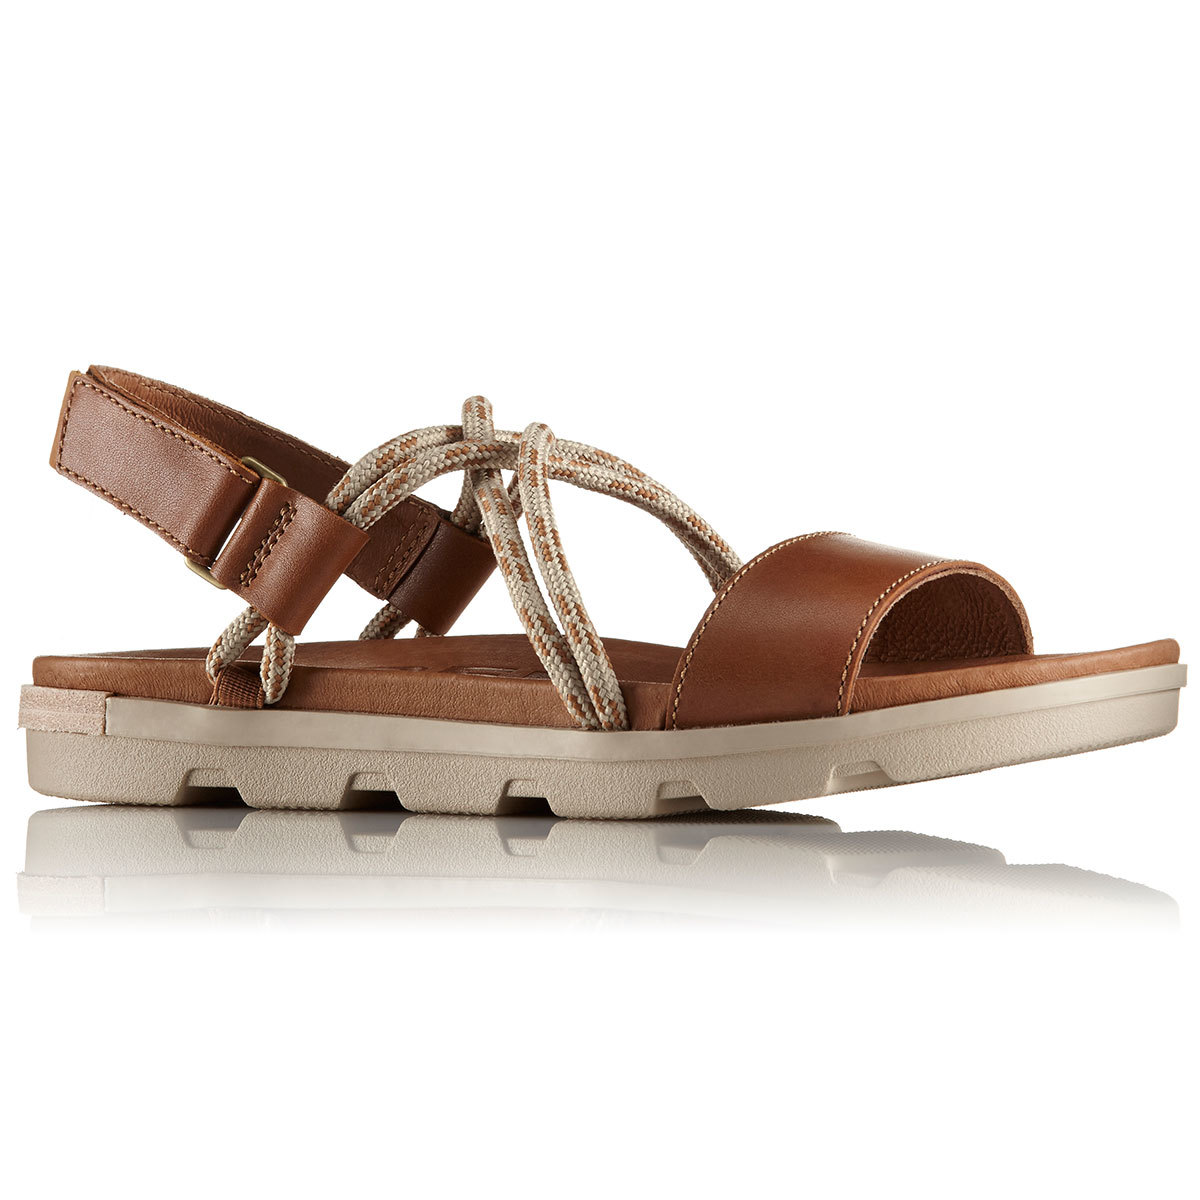 Sorel Women's Torpeda Ii Sandals - Brown, 9.5